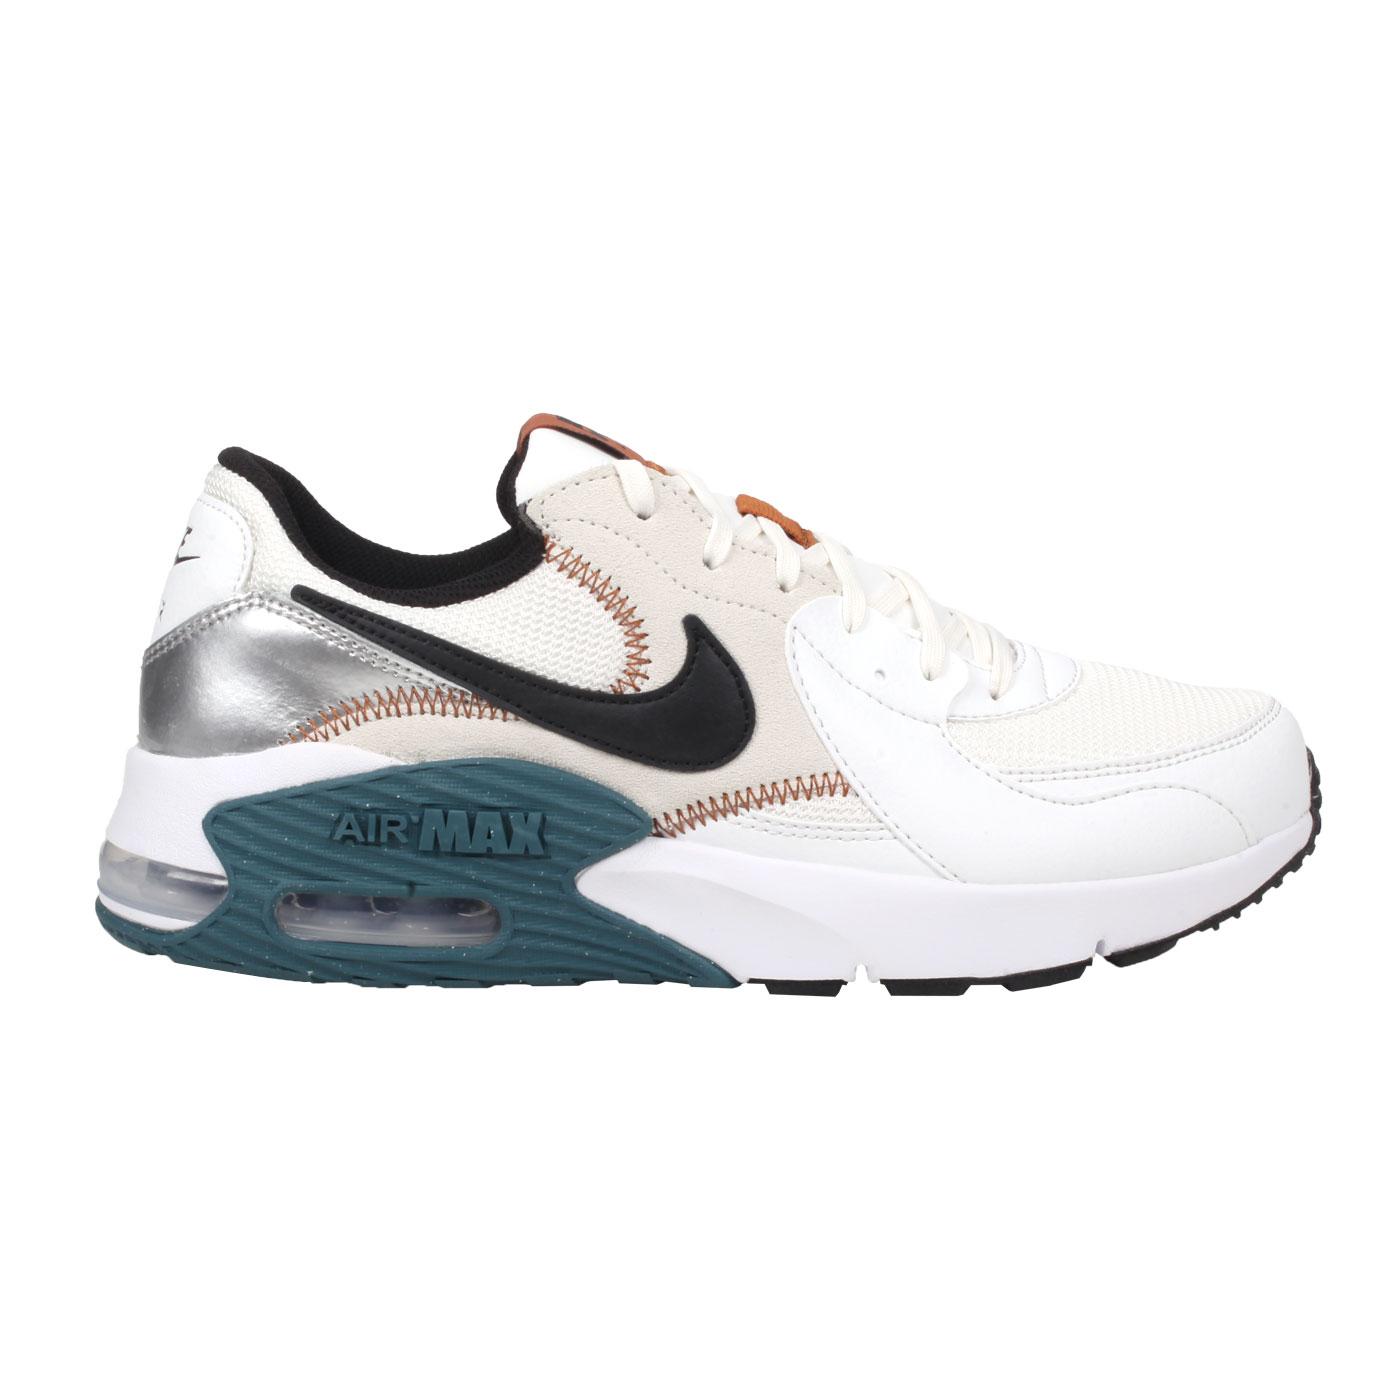 NIKE 男款休閒運動鞋  @AIR MAX EXCEE@CD4165107 - 白米黑墨藍